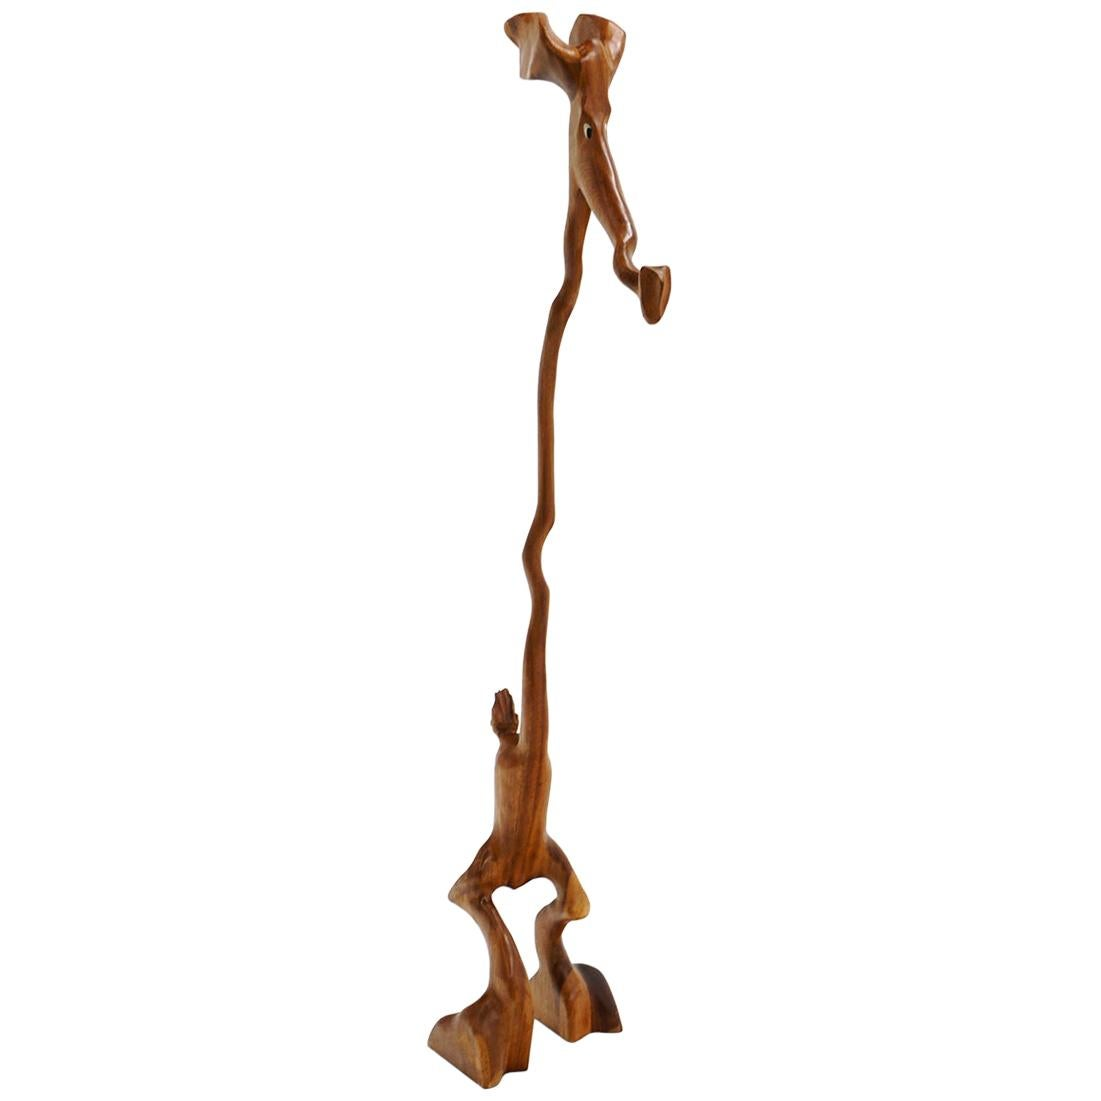 Tall Danish Teak Animal Sculpture by Knud Albert, Denmark, Signed